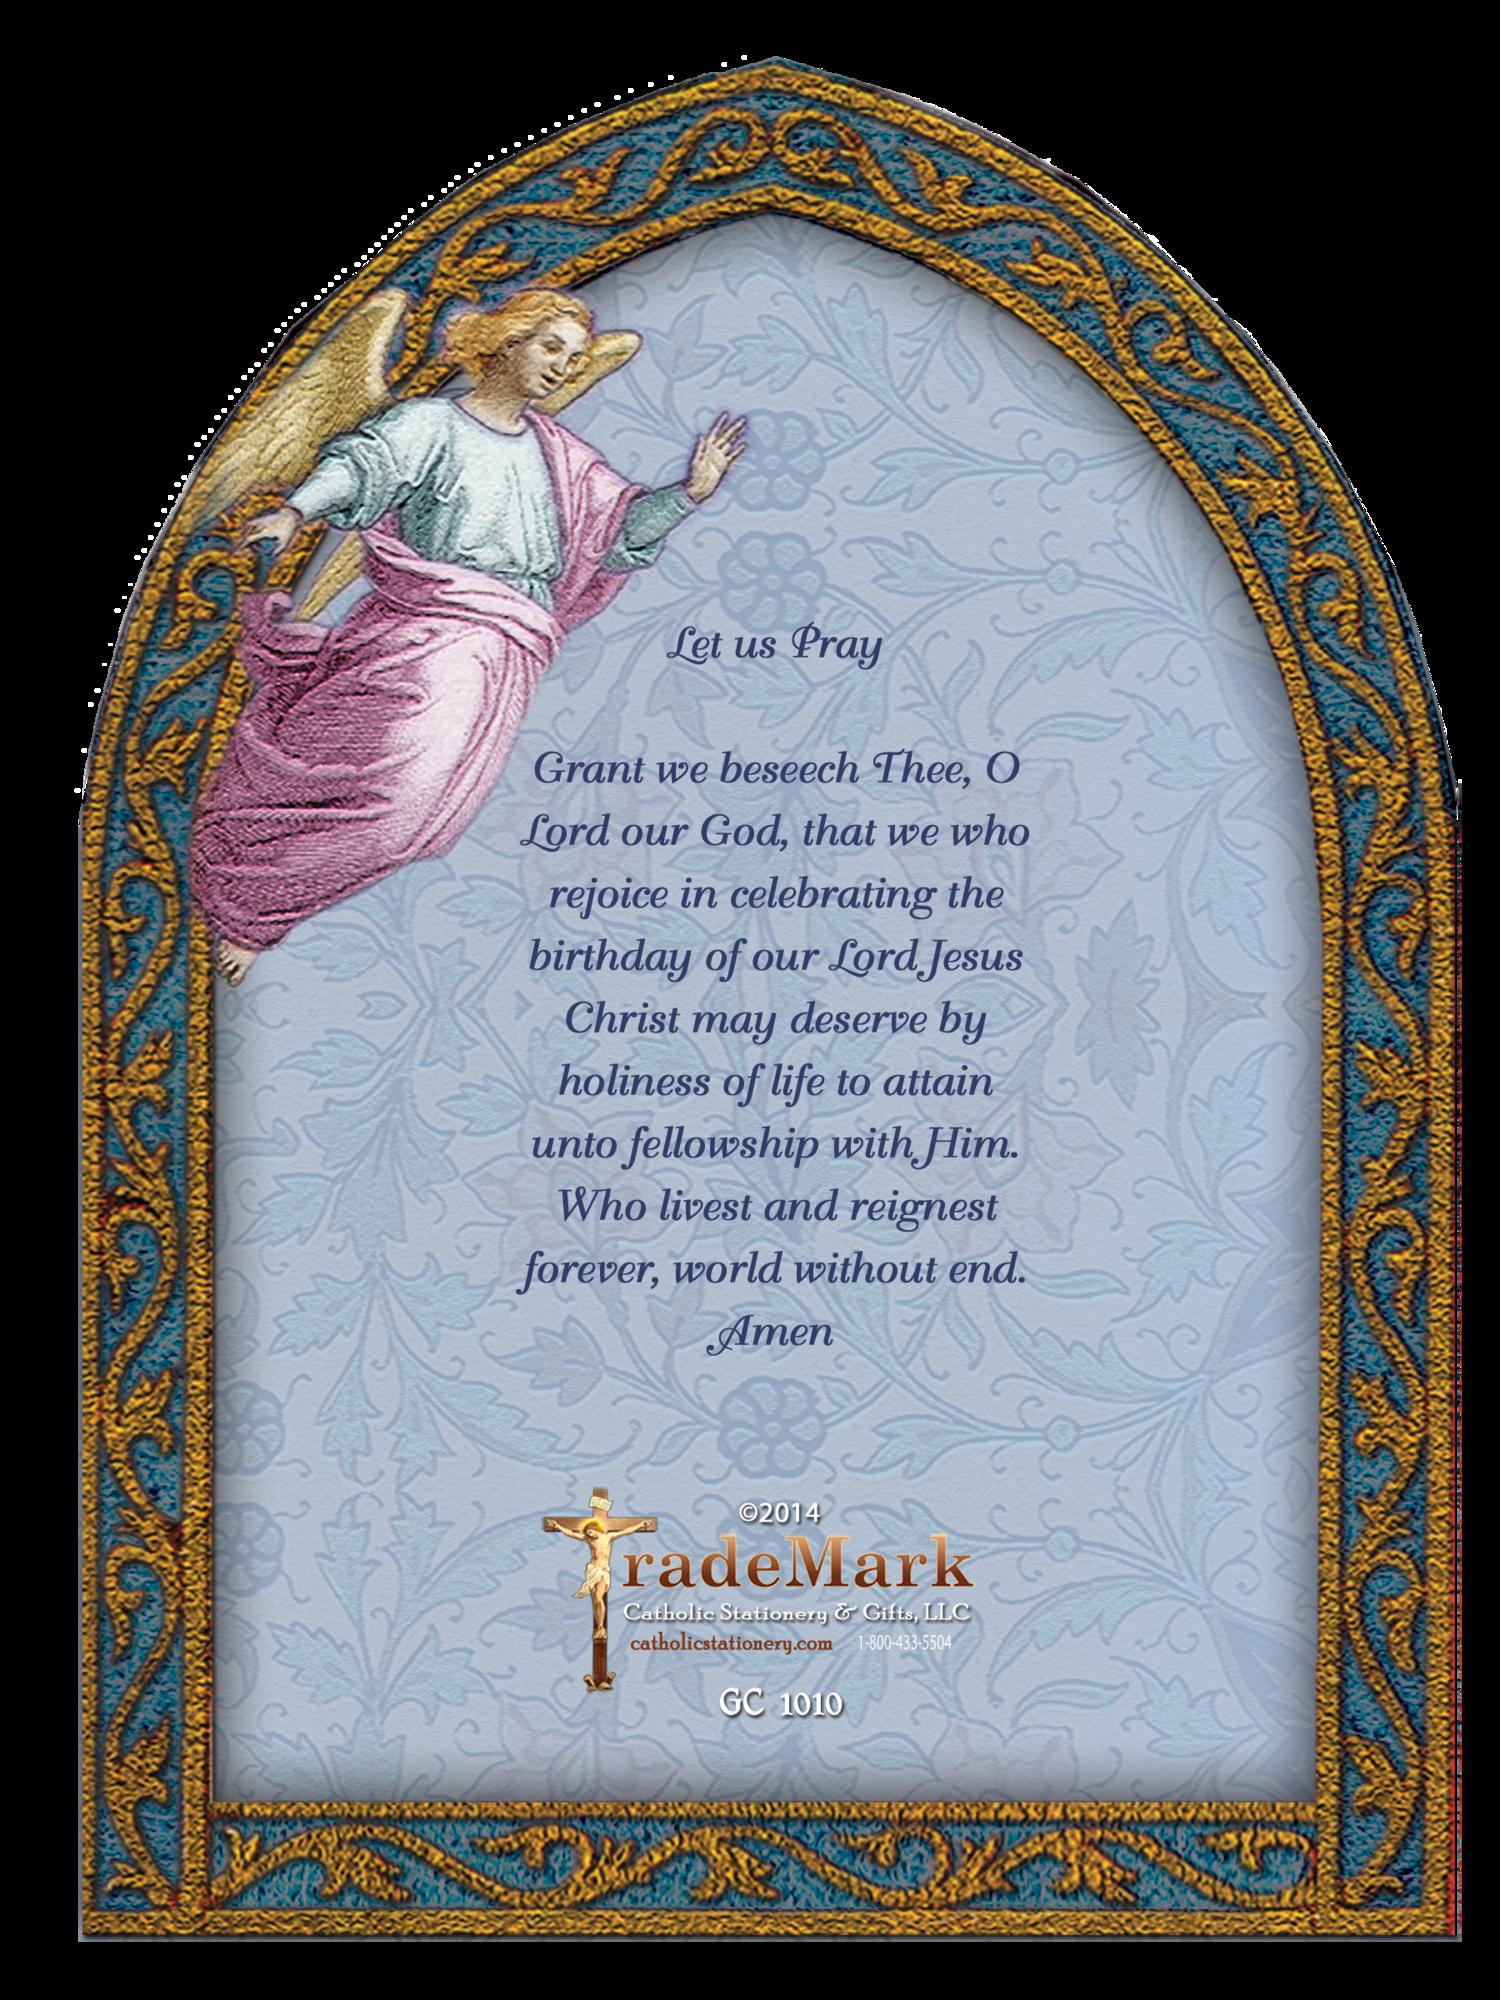 1010 Christmas Greeting Card Trademark Catholic Stationery Gifts